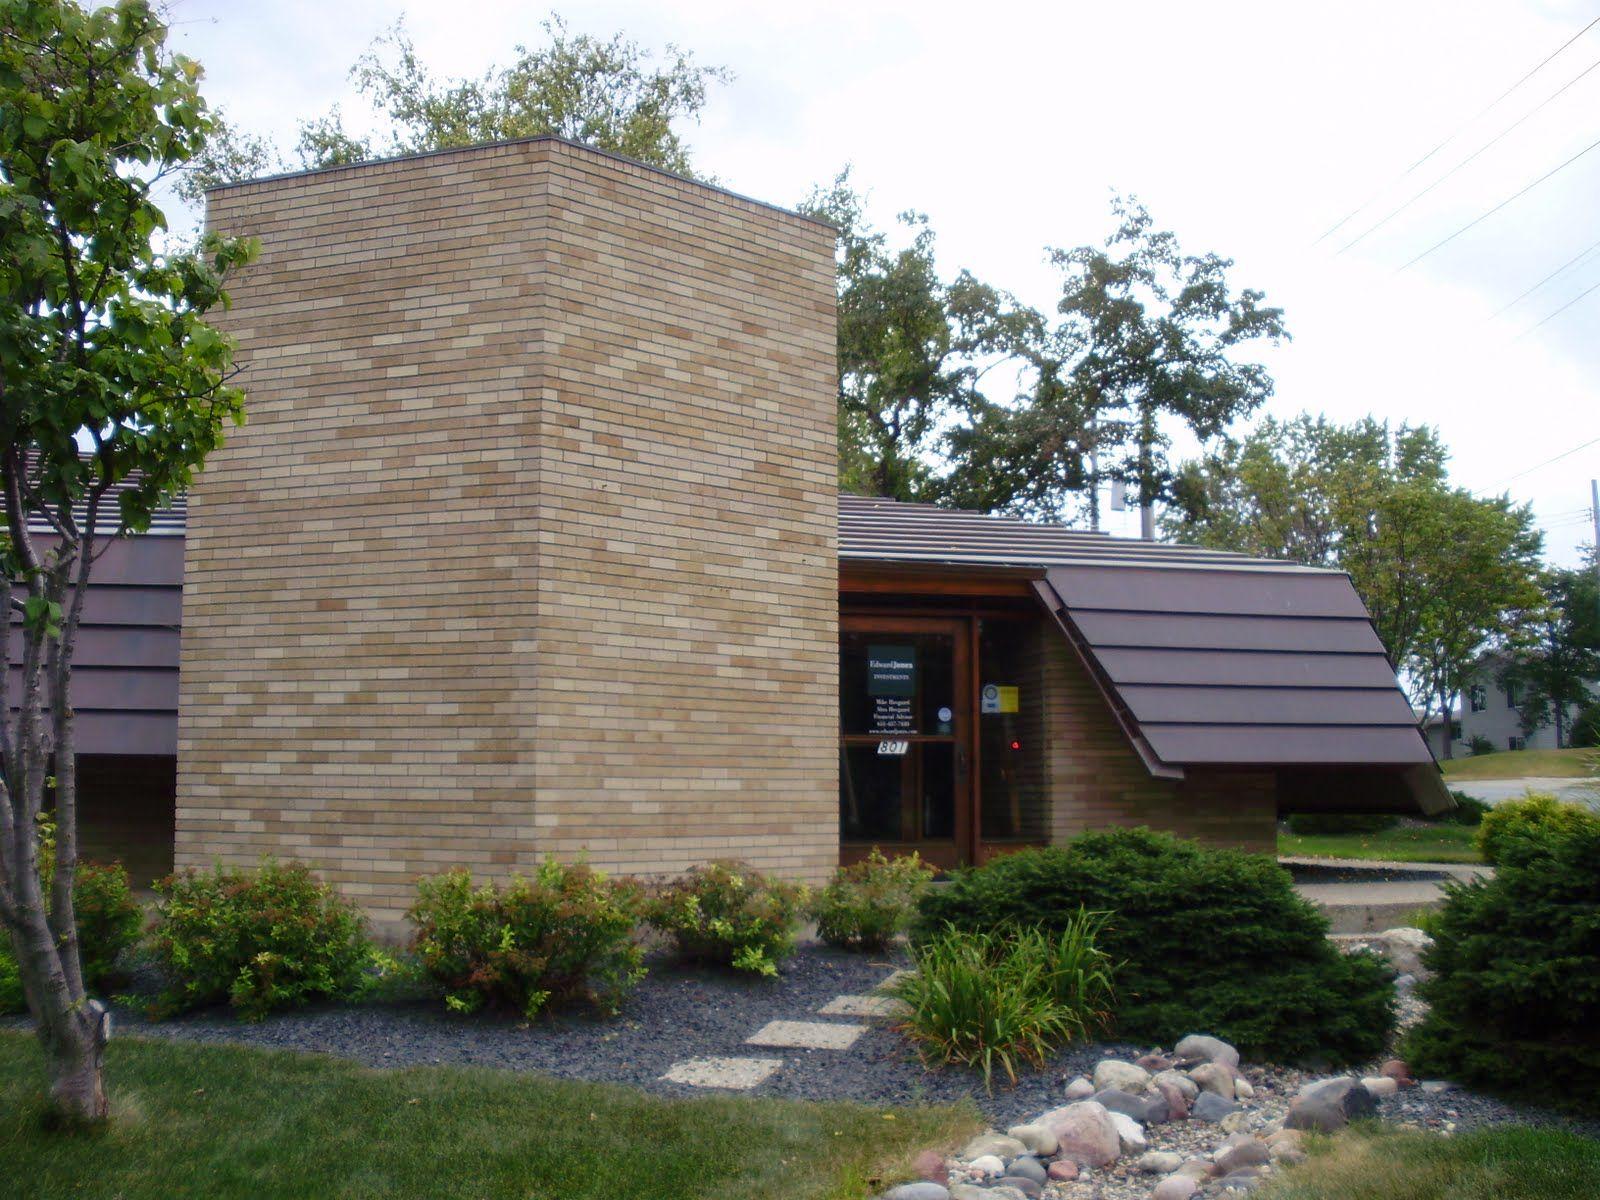 Herman Fasbender Medical Clinic by Frank Lloyd Wright in